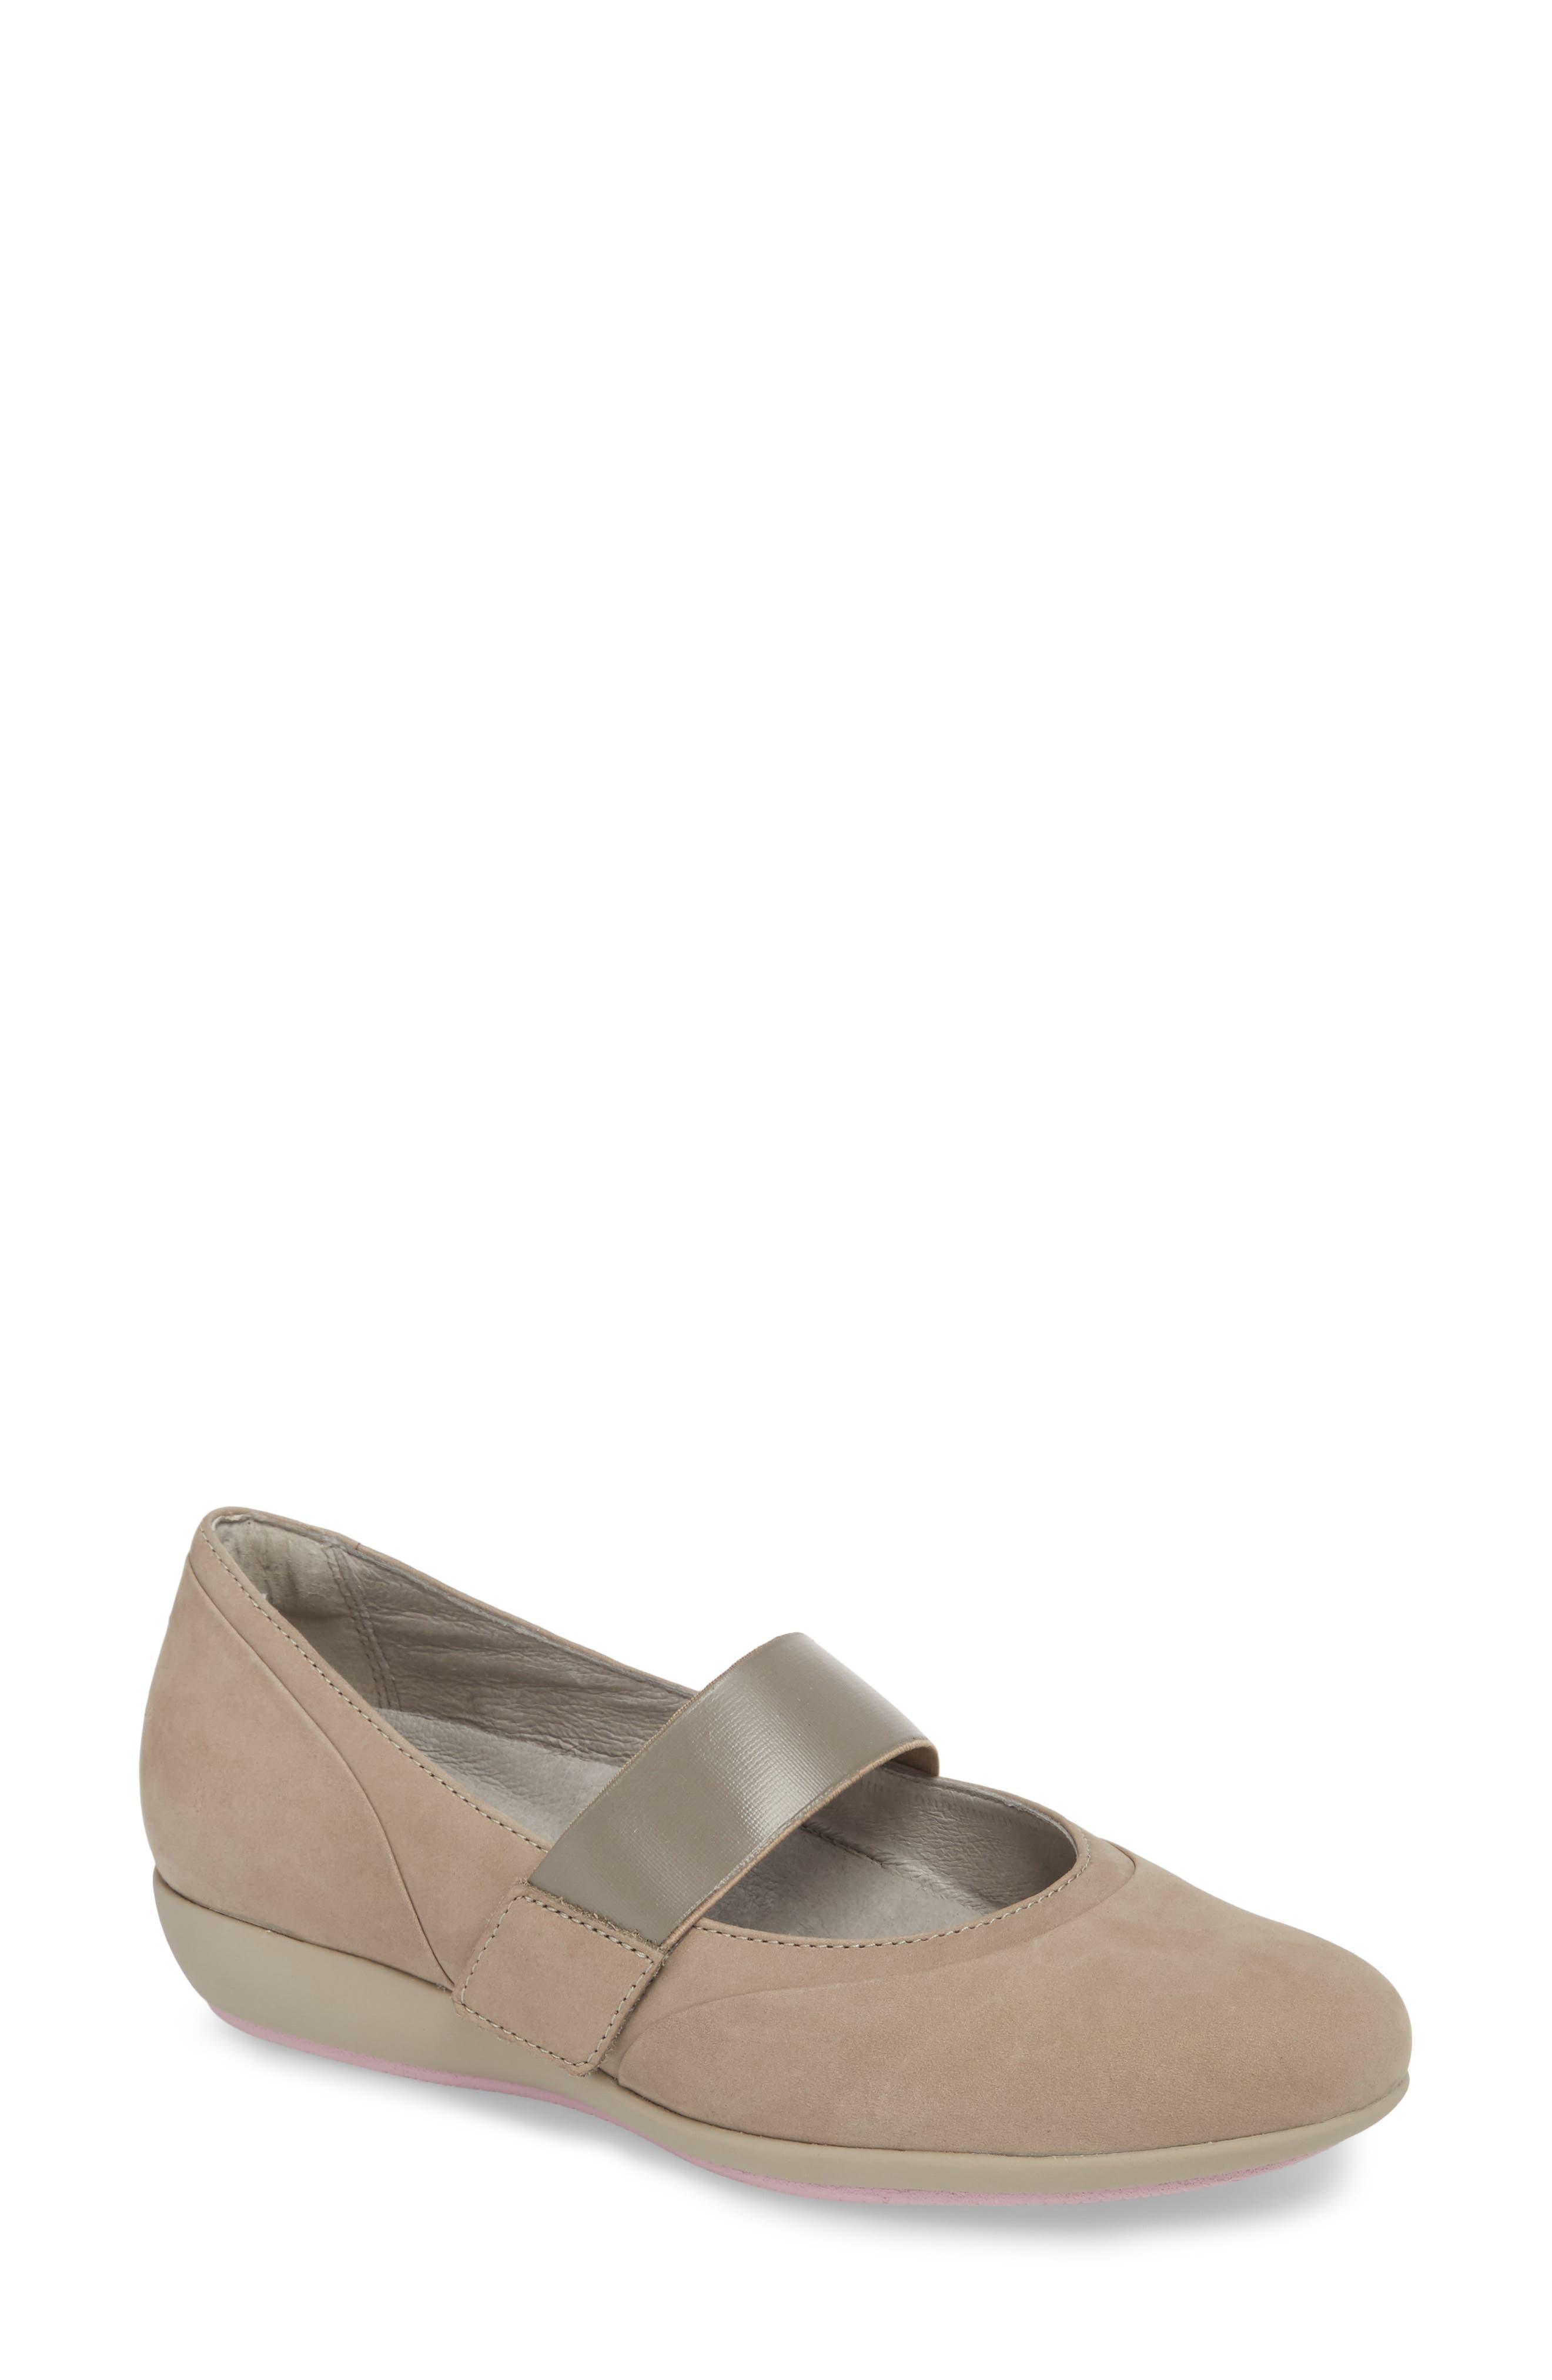 Dansko Kendra Mary Jane Wedge-6- Grey